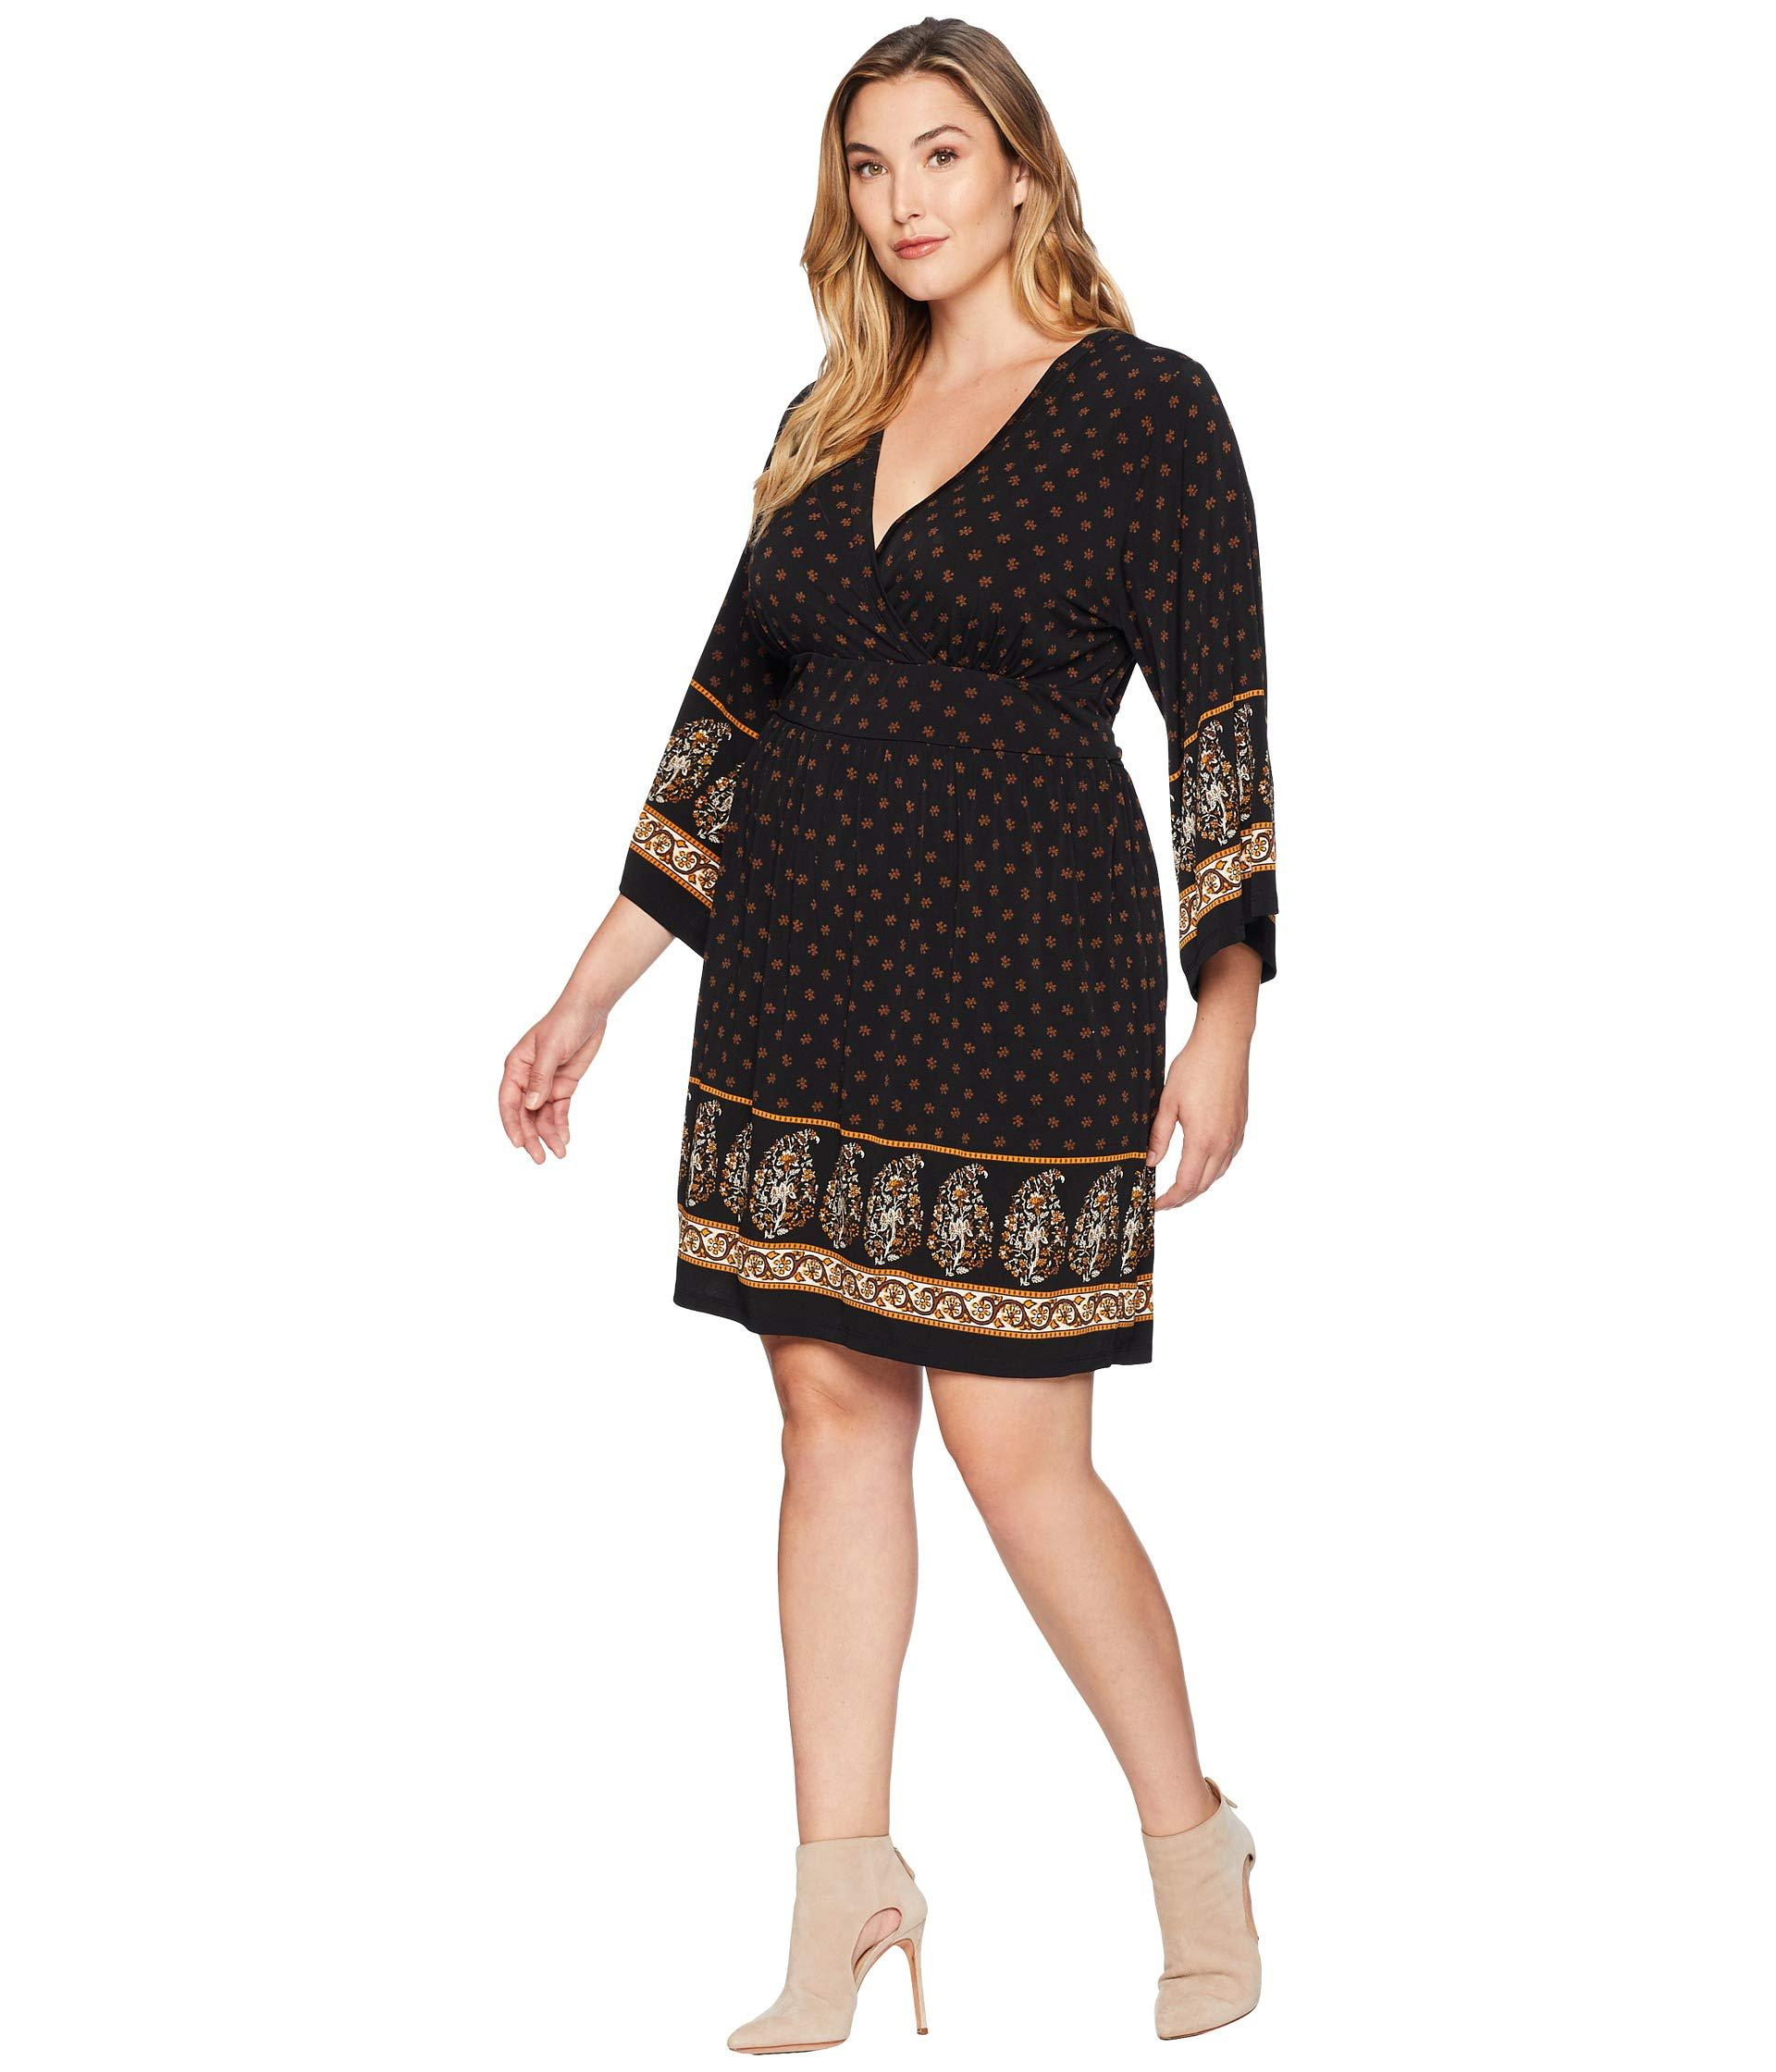 967c150c4df5b Lyst - MICHAEL Michael Kors Plus Size Paisley Garden Deep Vee Dress in  Black - Save 36%